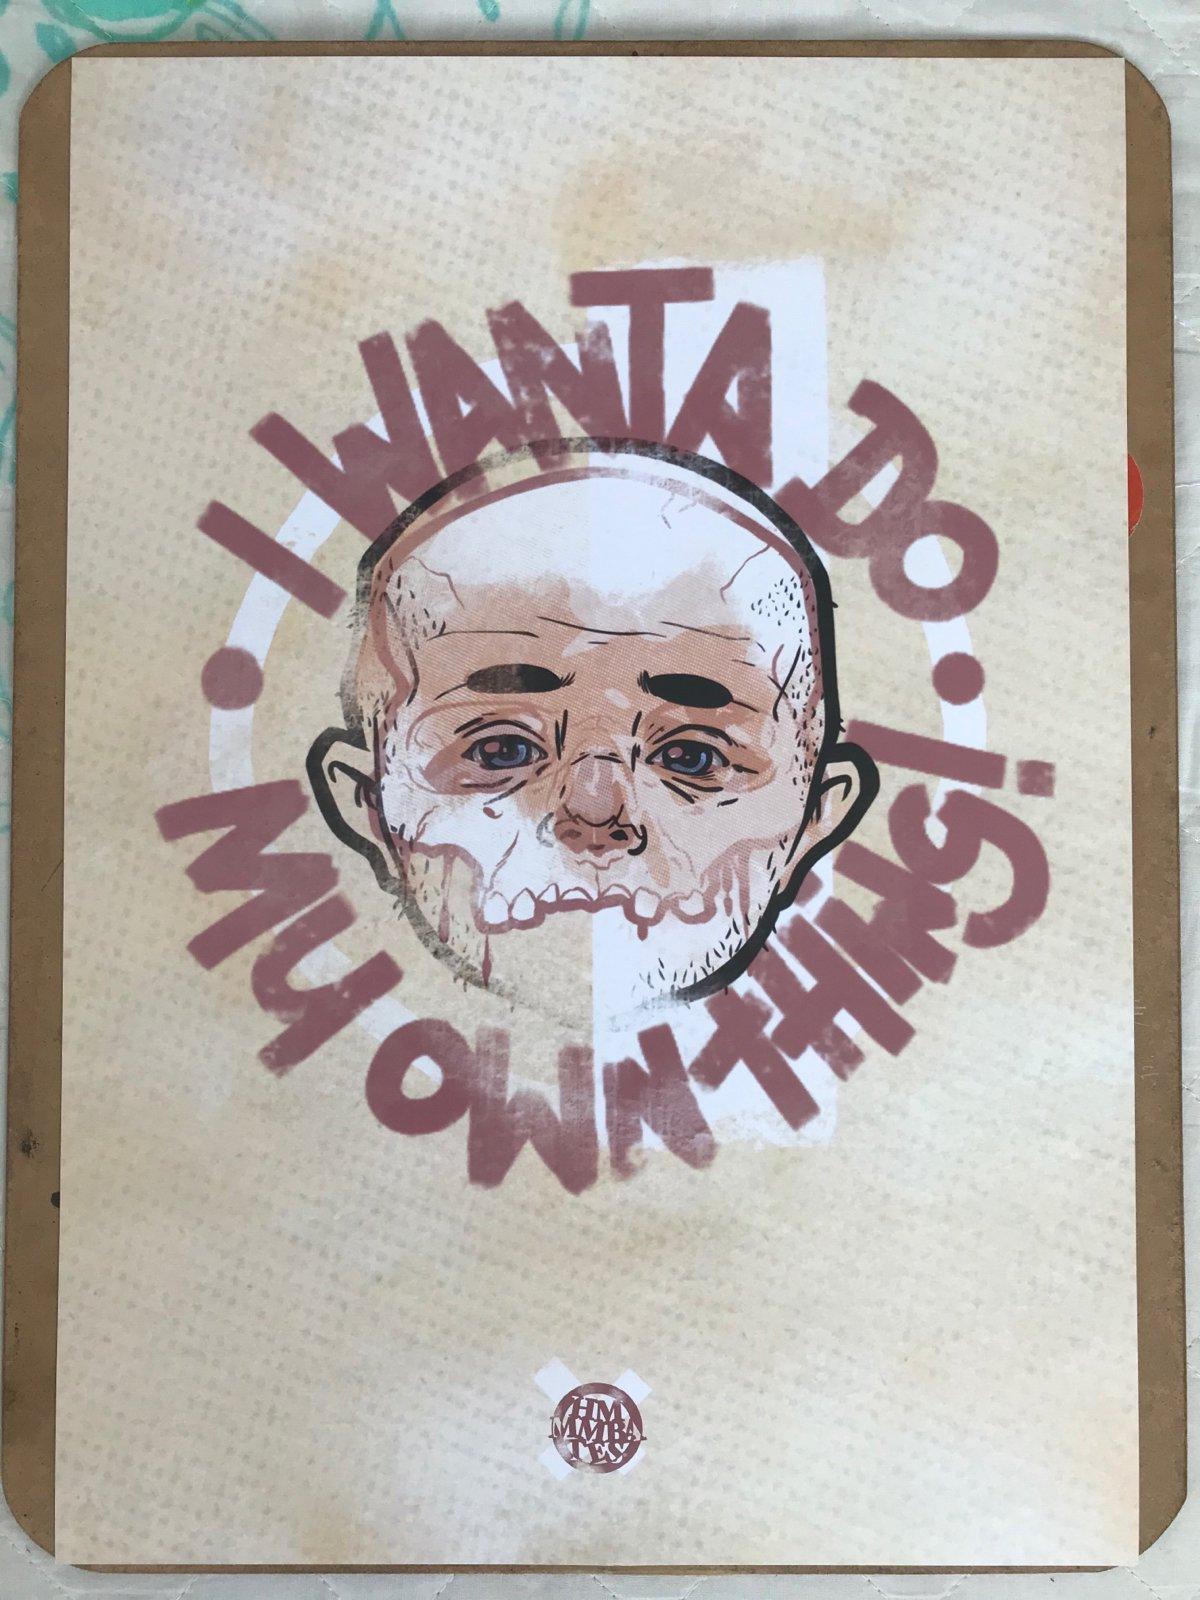 Image of Hmmmbates boy skull print!!